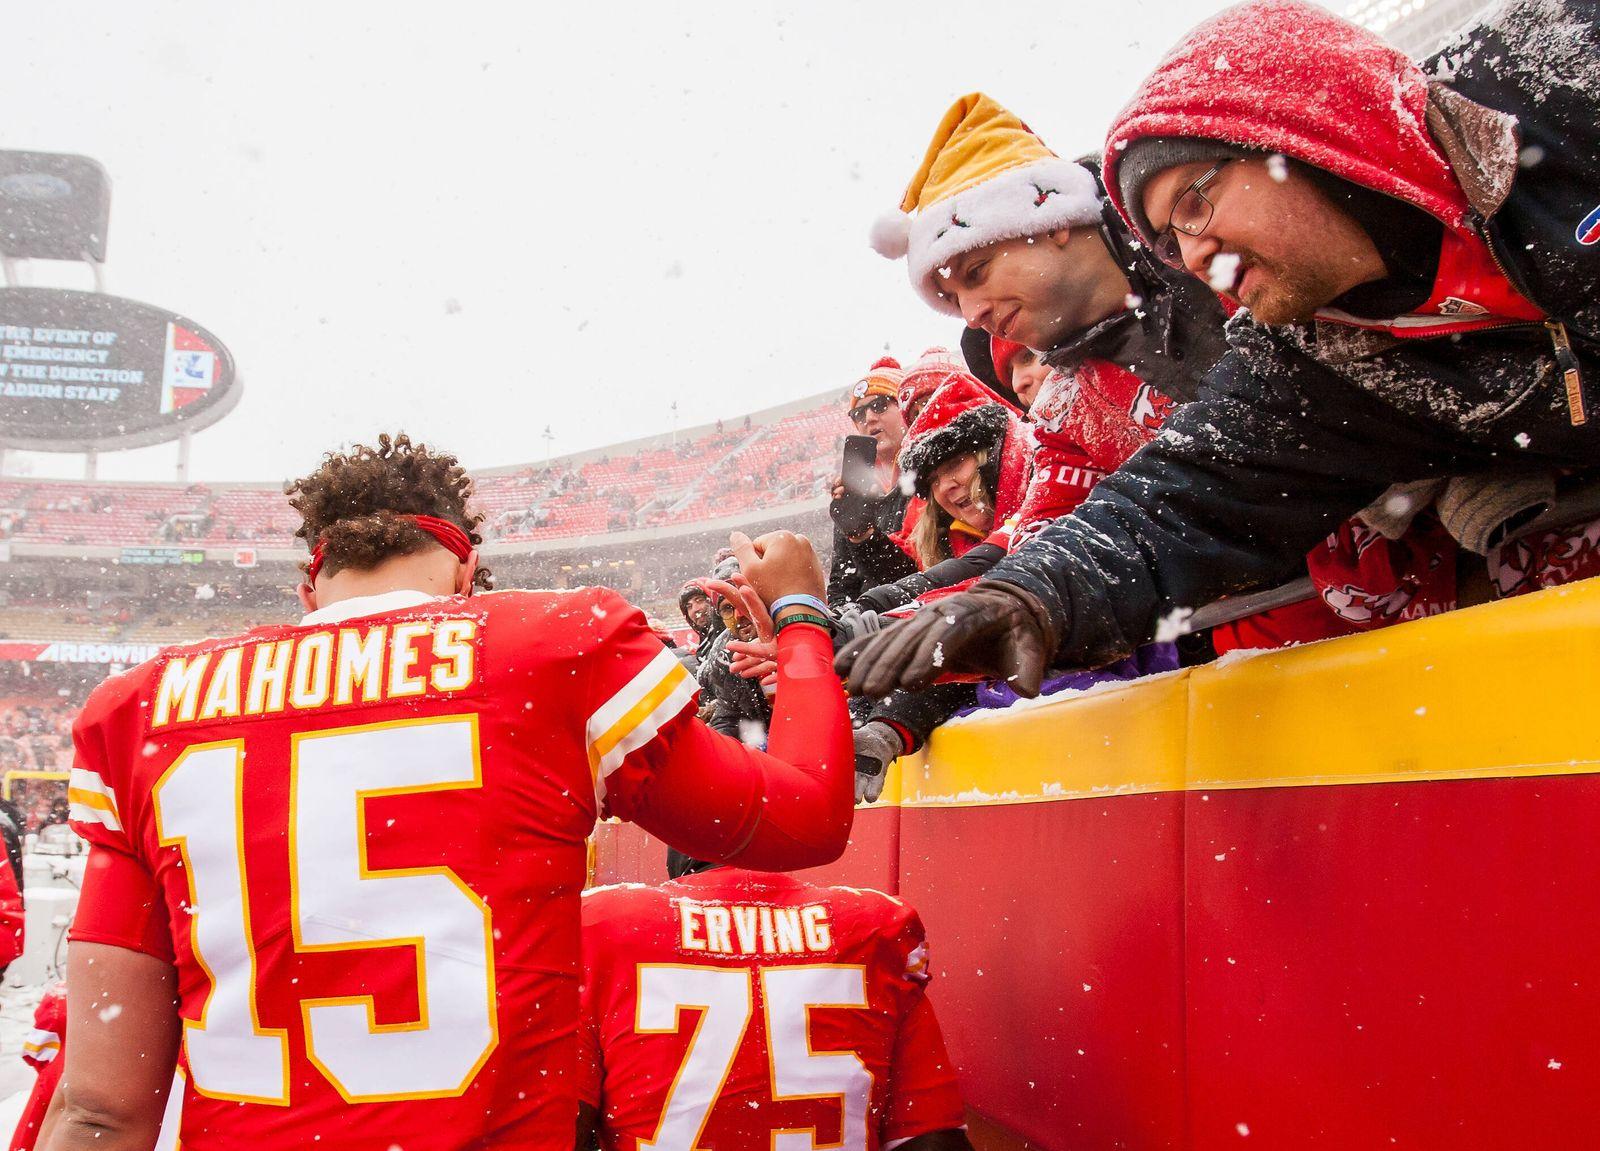 December 15, 2019, Kansas City, MO, USA: KANSAS Kansas City, MO - DECEMBER 15: Kansas City Chiefs quarterback Patrick M